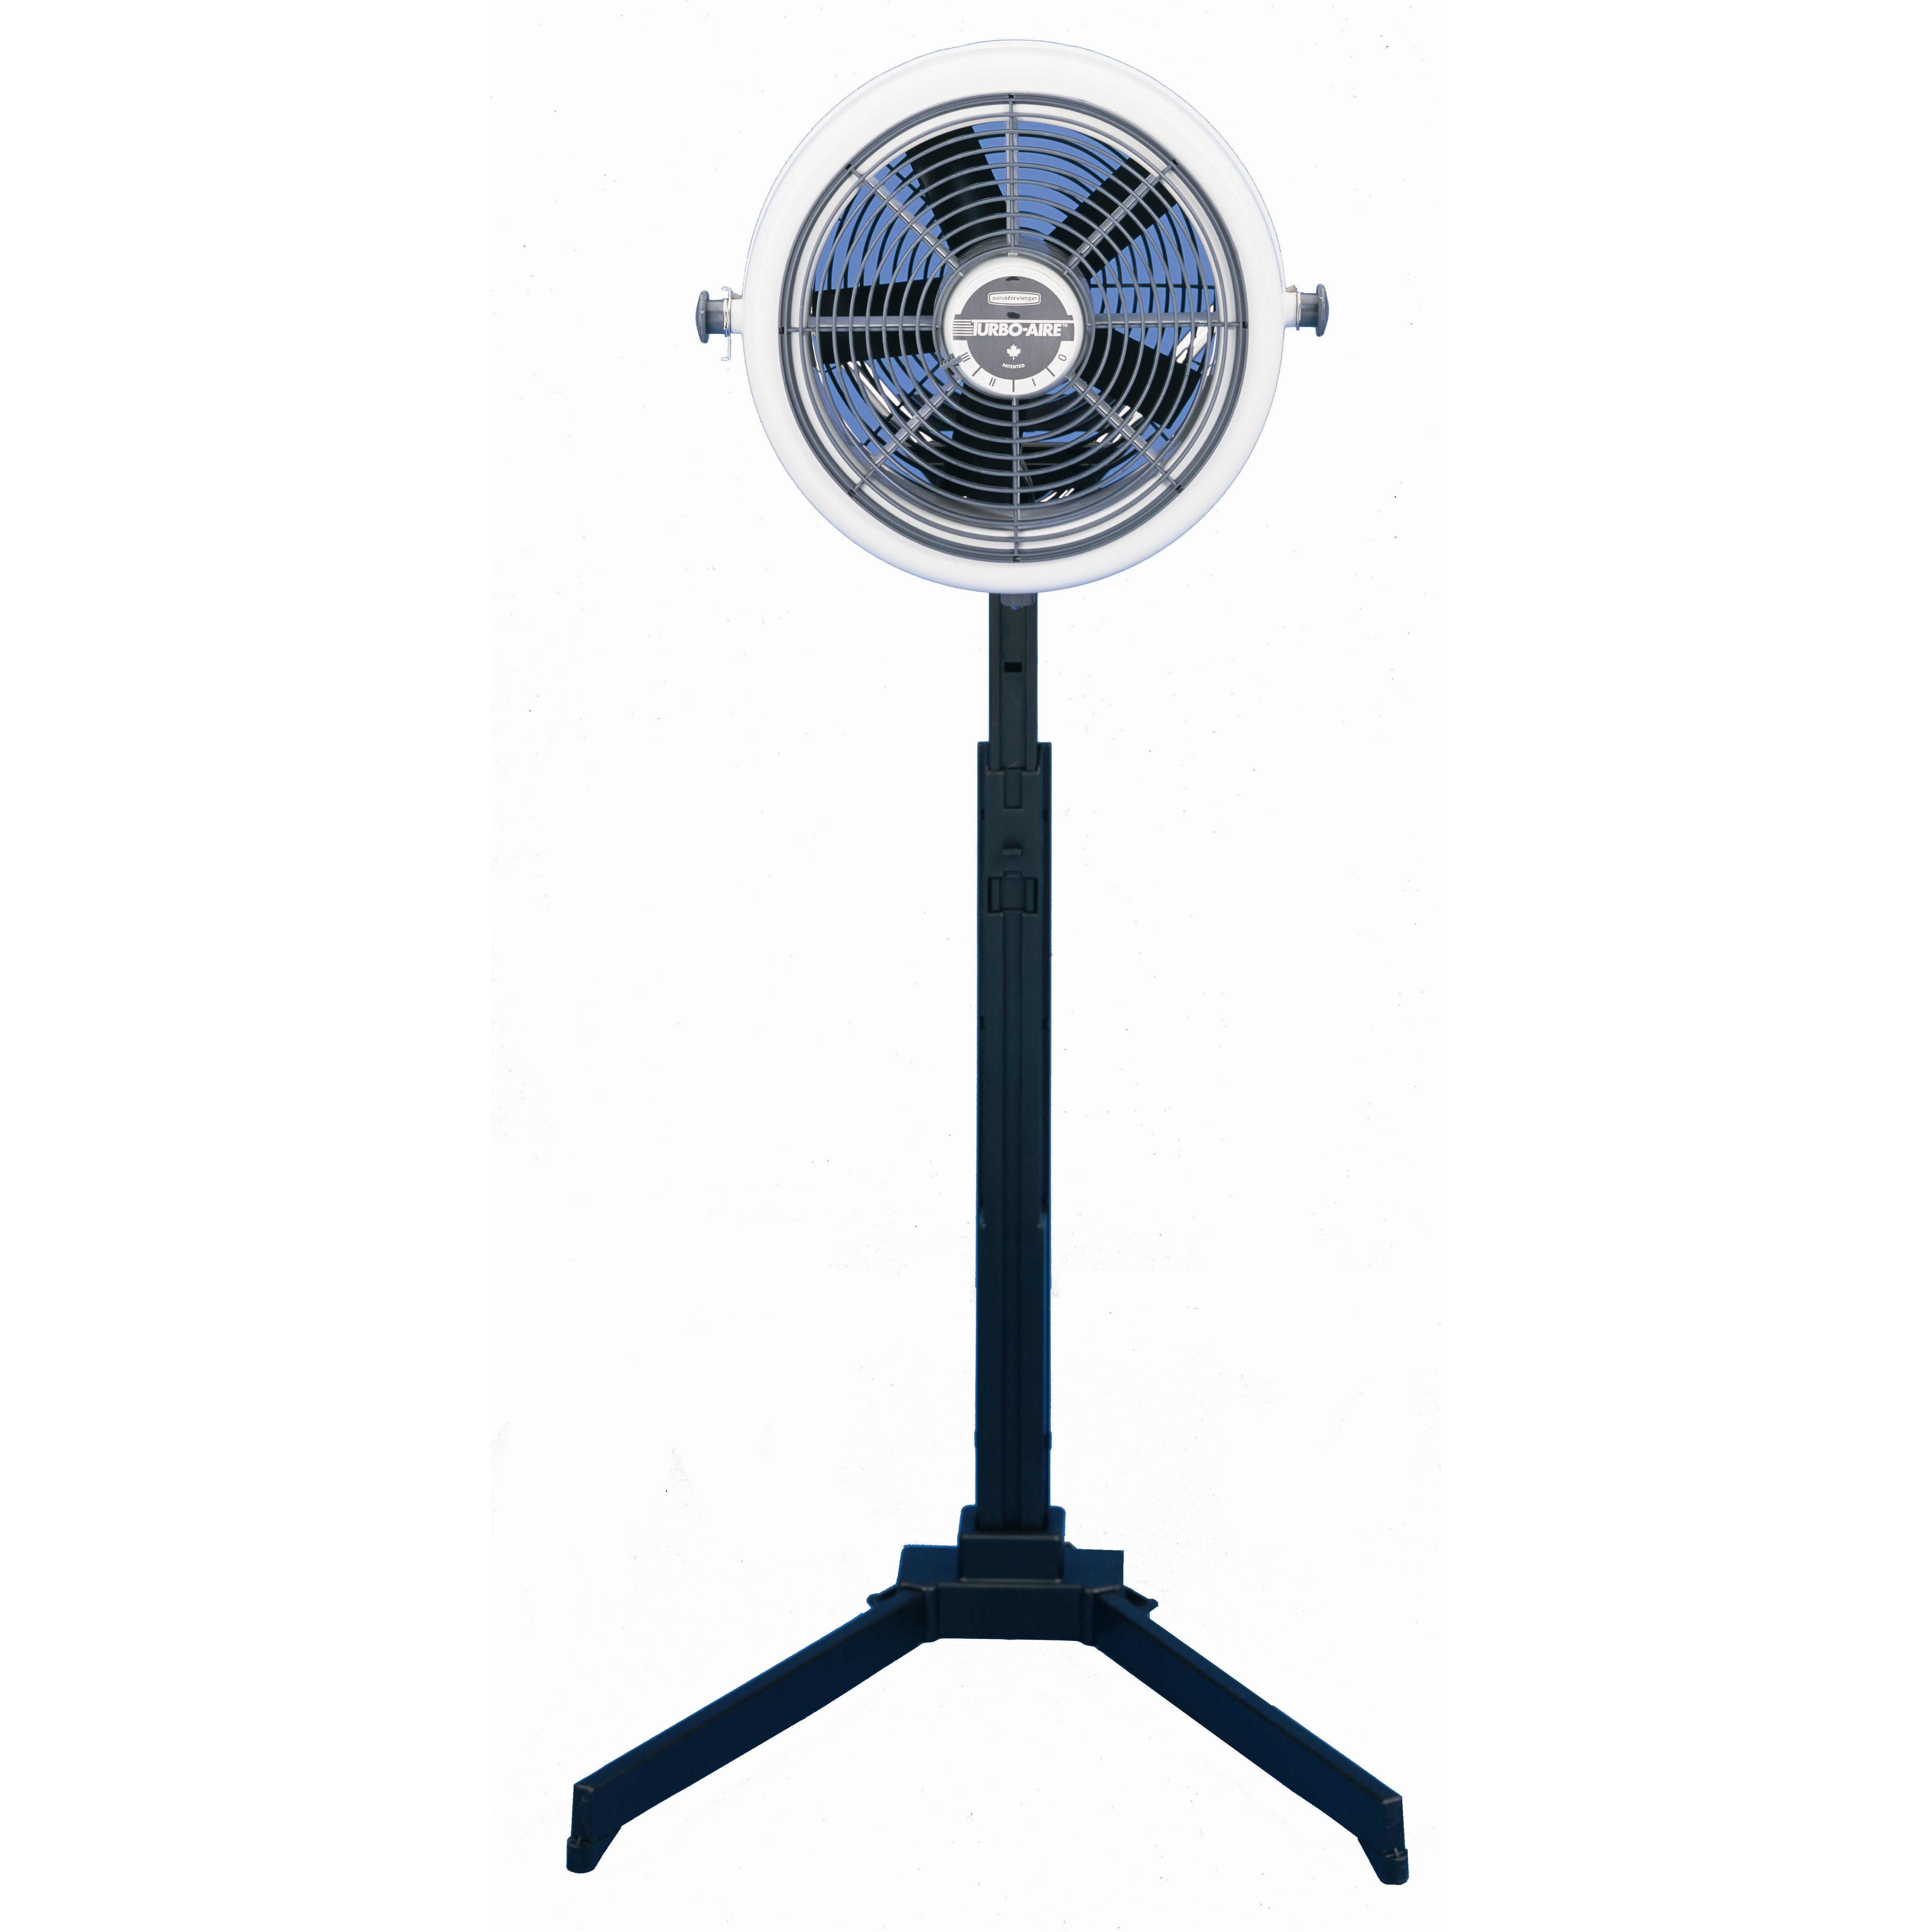 Electric Floor Fans : Seabreeze electric high velocity floor fan reviews wayfair